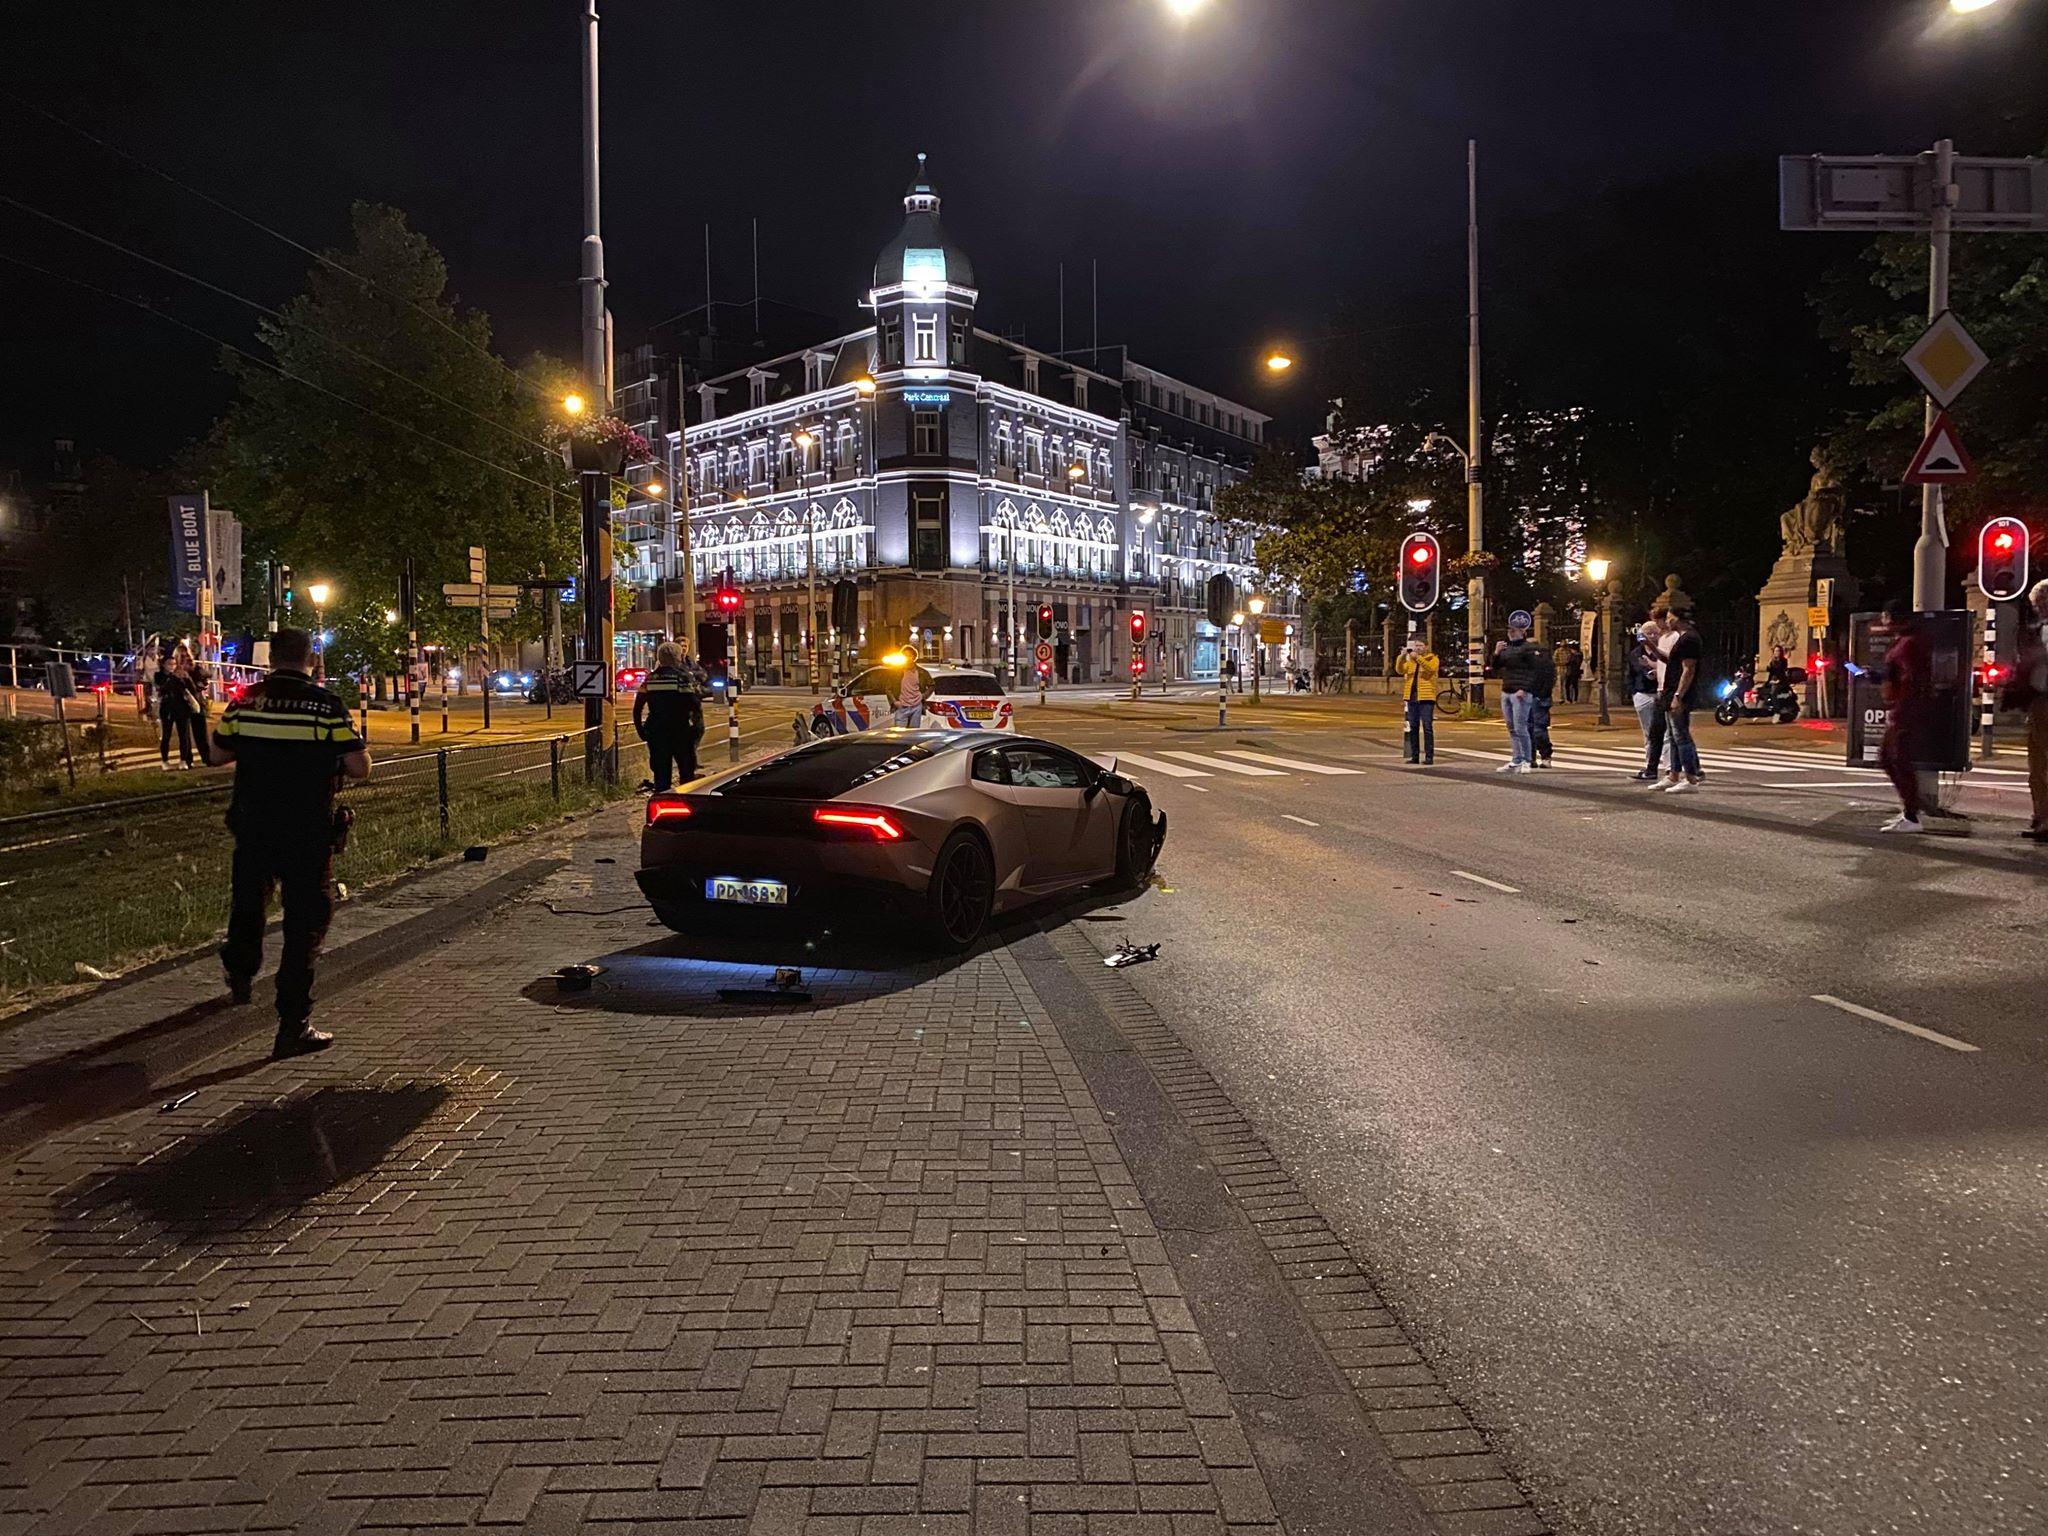 Dave Roelvink rijdt Lamborghini Huracán plat